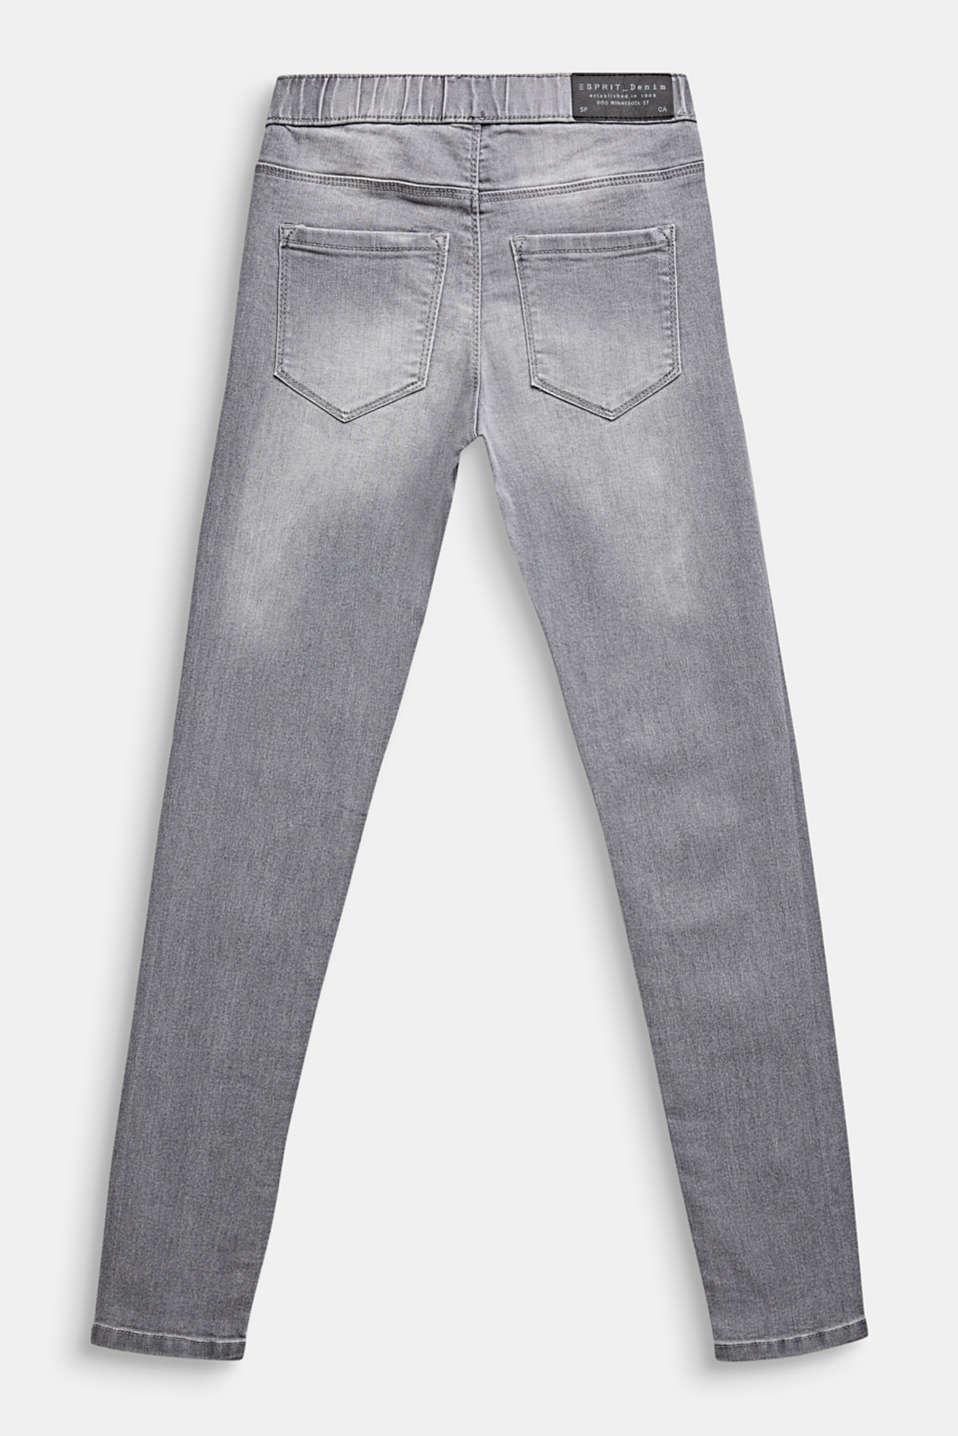 Garment-washed grey jeggings, LCGREY LIGHT WAS, detail image number 1